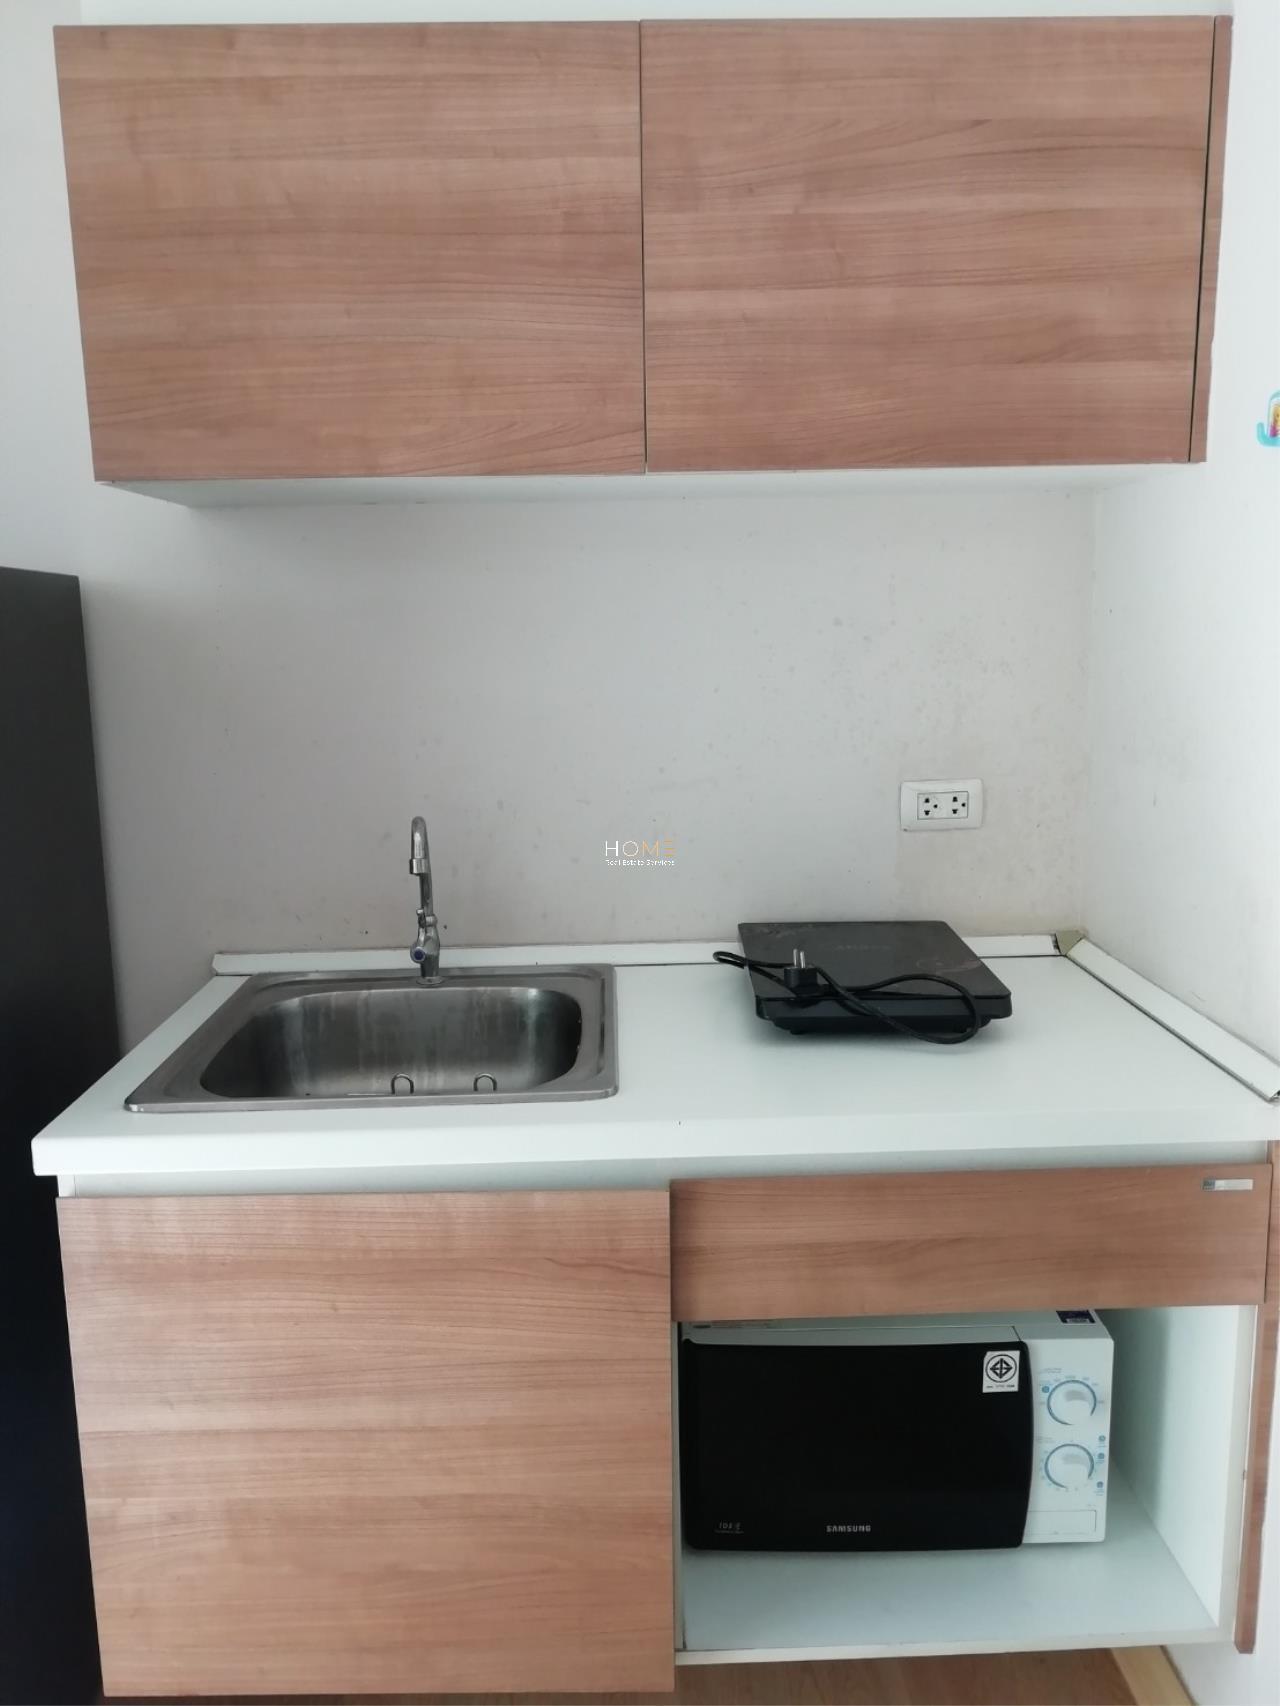 HOME - Real Estate Services Agency's Emerald Residence Ratchada / 1 Bed (FOR SALE & RENT), เอมเมอรัลด์ เรสซิเดนท์ รัชดา / 1 ห้องนอน (ขายและให้เช่า) Nub045 3